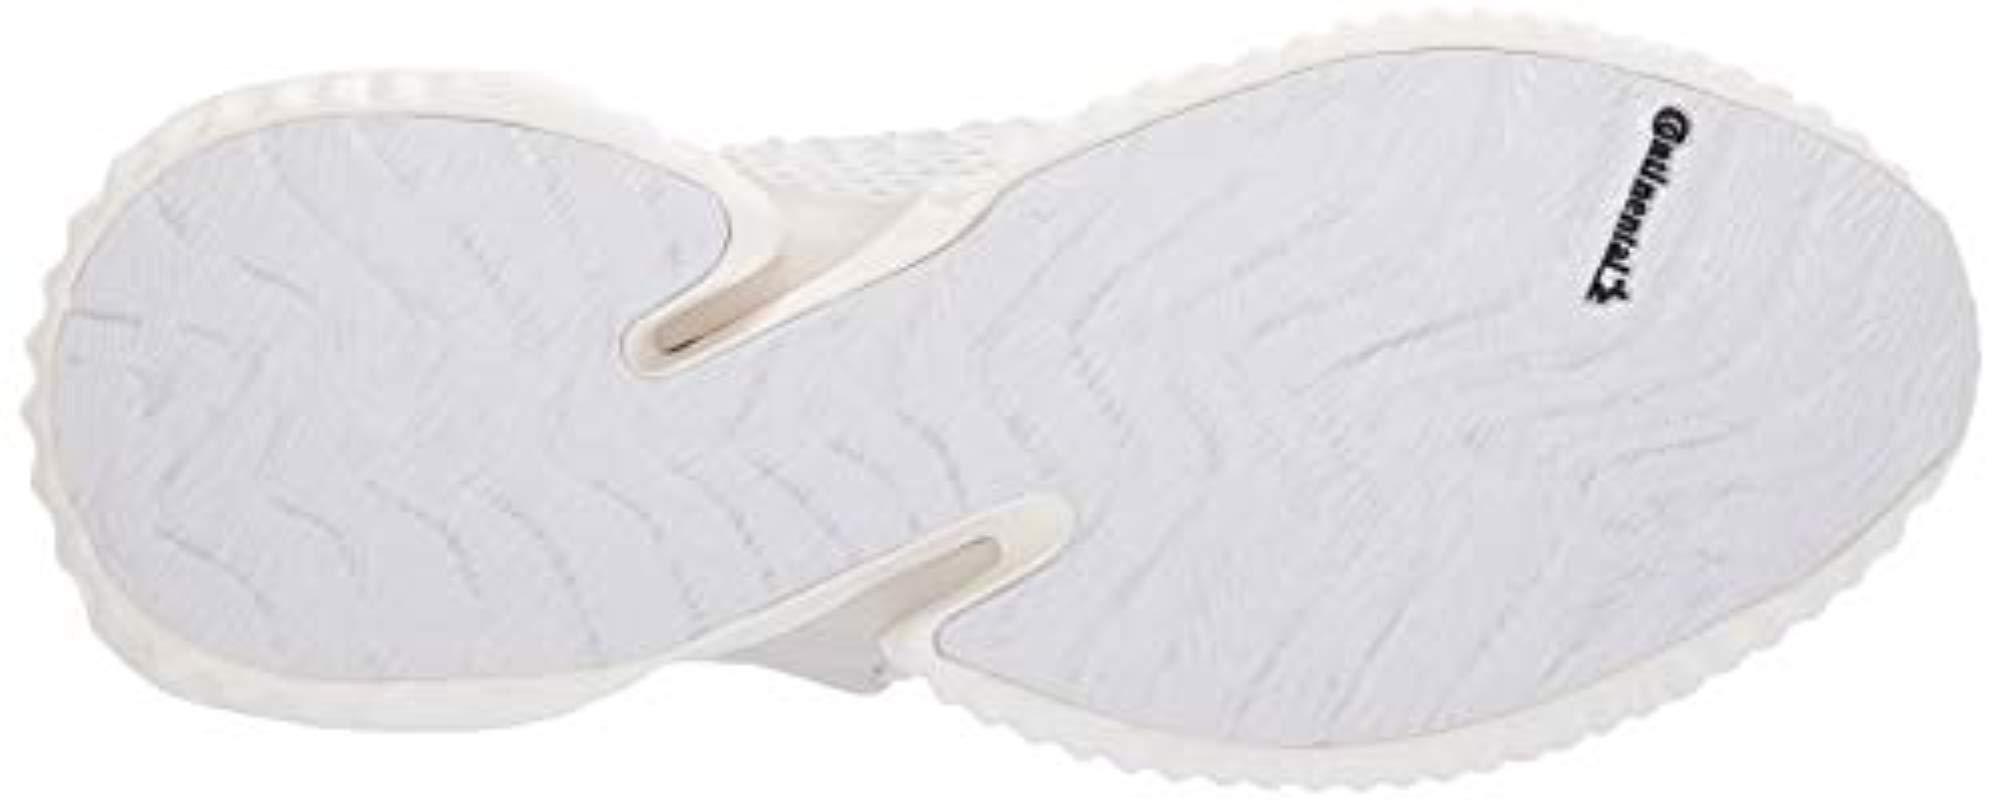 buy online 3338c eb41a Adidas - White Alphabounce Instinct Running Shoe for Men - Lyst. View  fullscreen